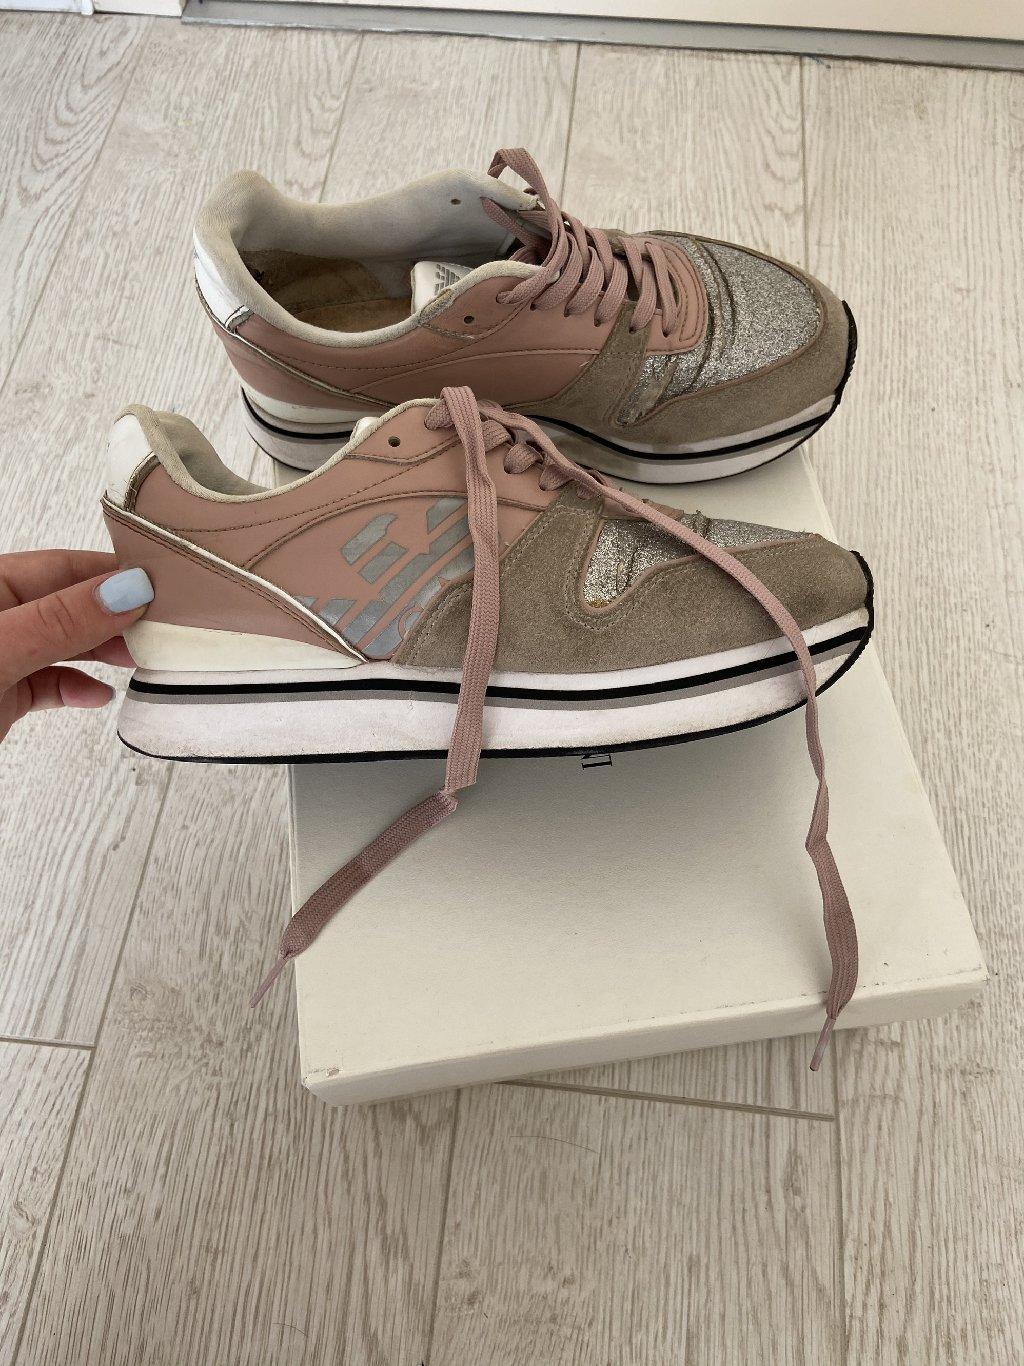 Ženska patike i atletske cipele 37